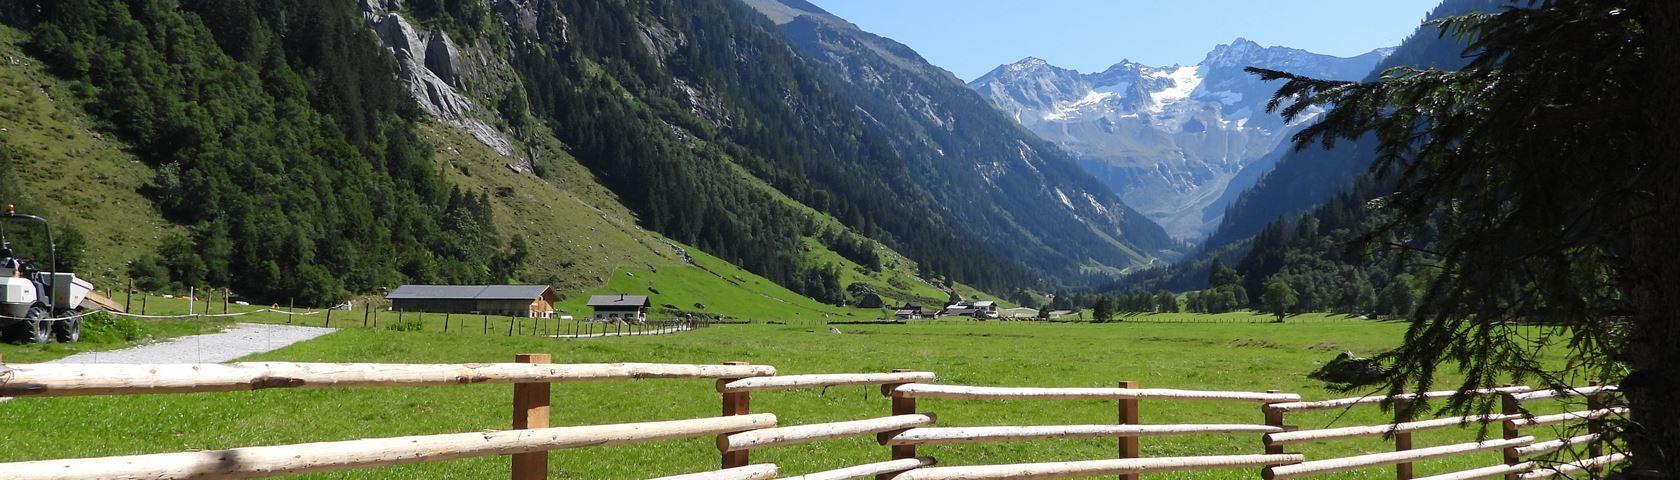 Surrounding Stilluptal in Zillertal